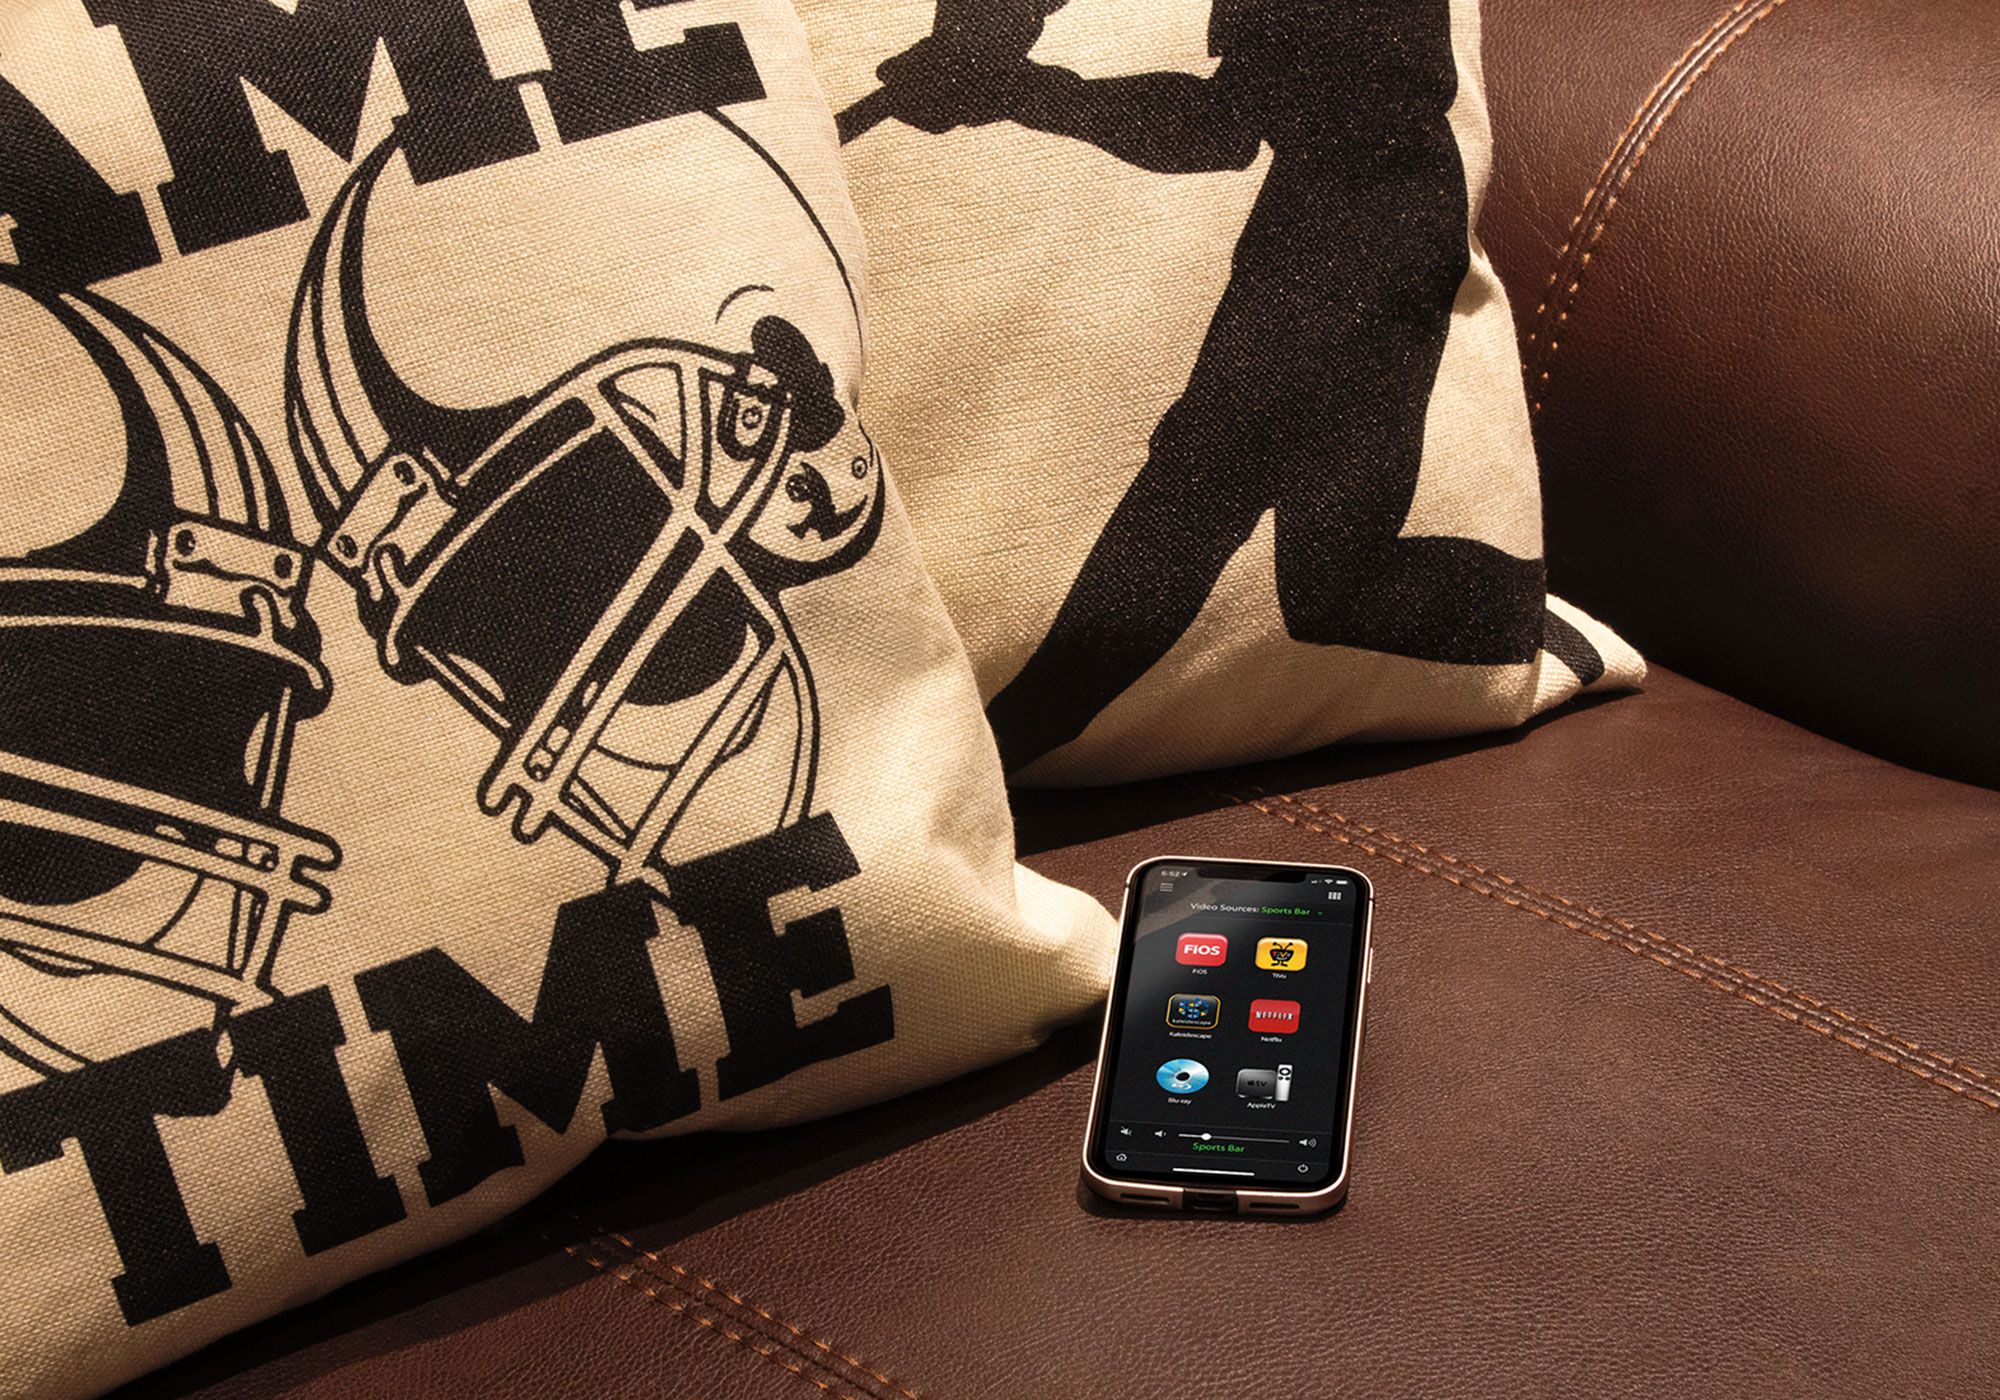 iPhone, video screen